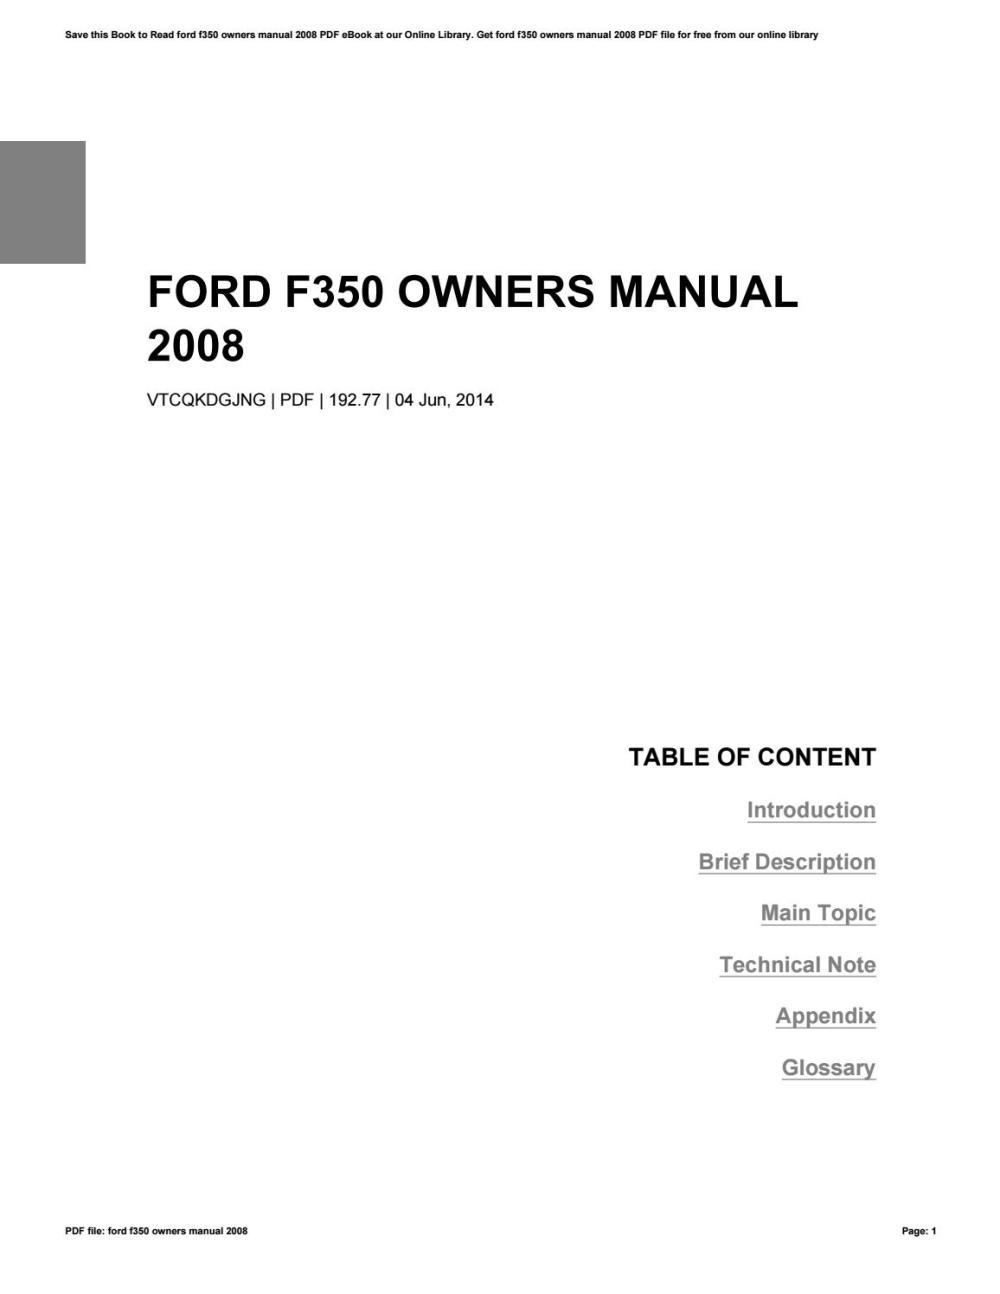 medium resolution of 2008 ford f350 owner manual